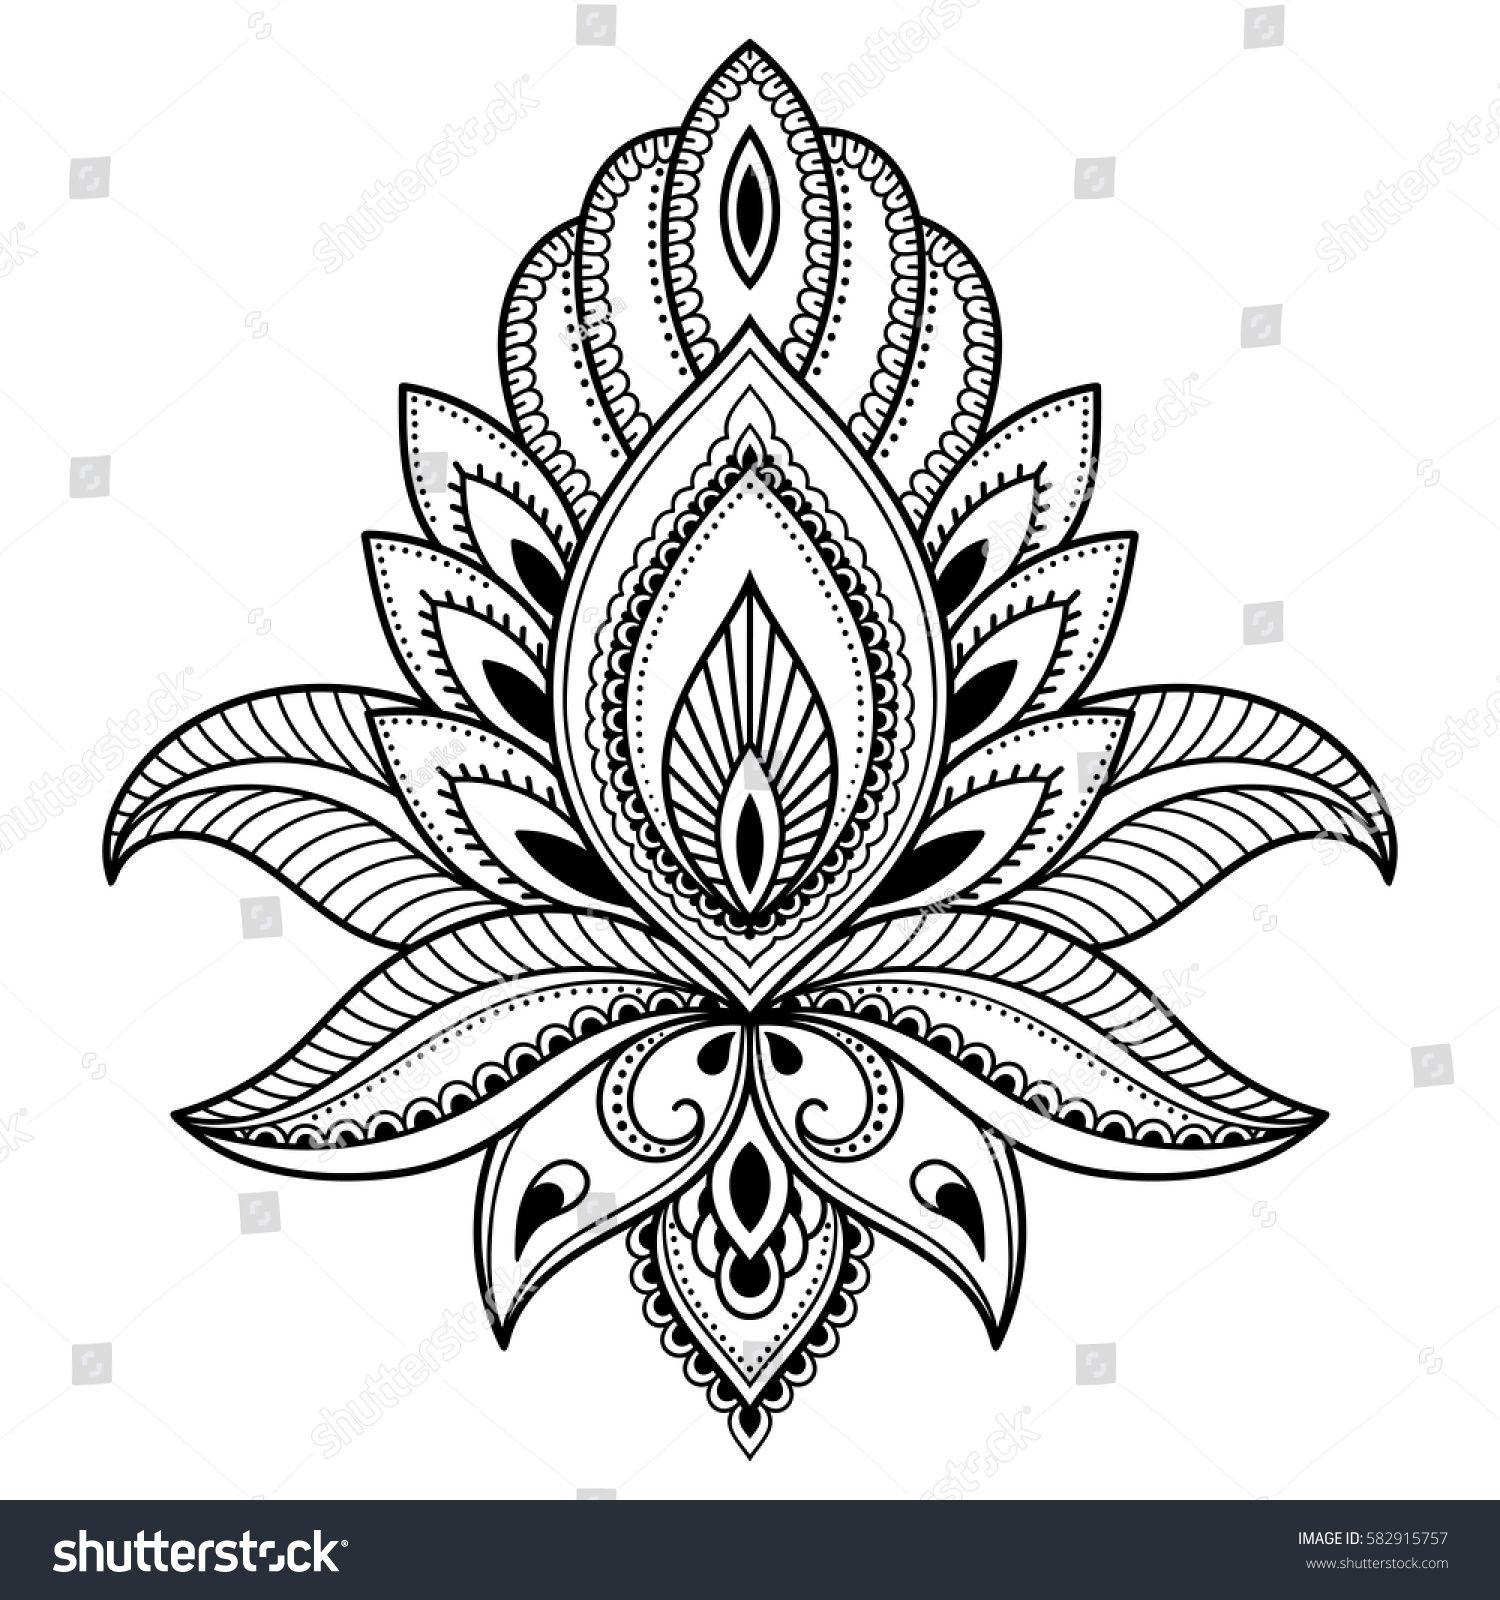 Mehndi Lotus Flower Pattern For Henna Drawing And Tattoo Patronen Tatoeages Stokken